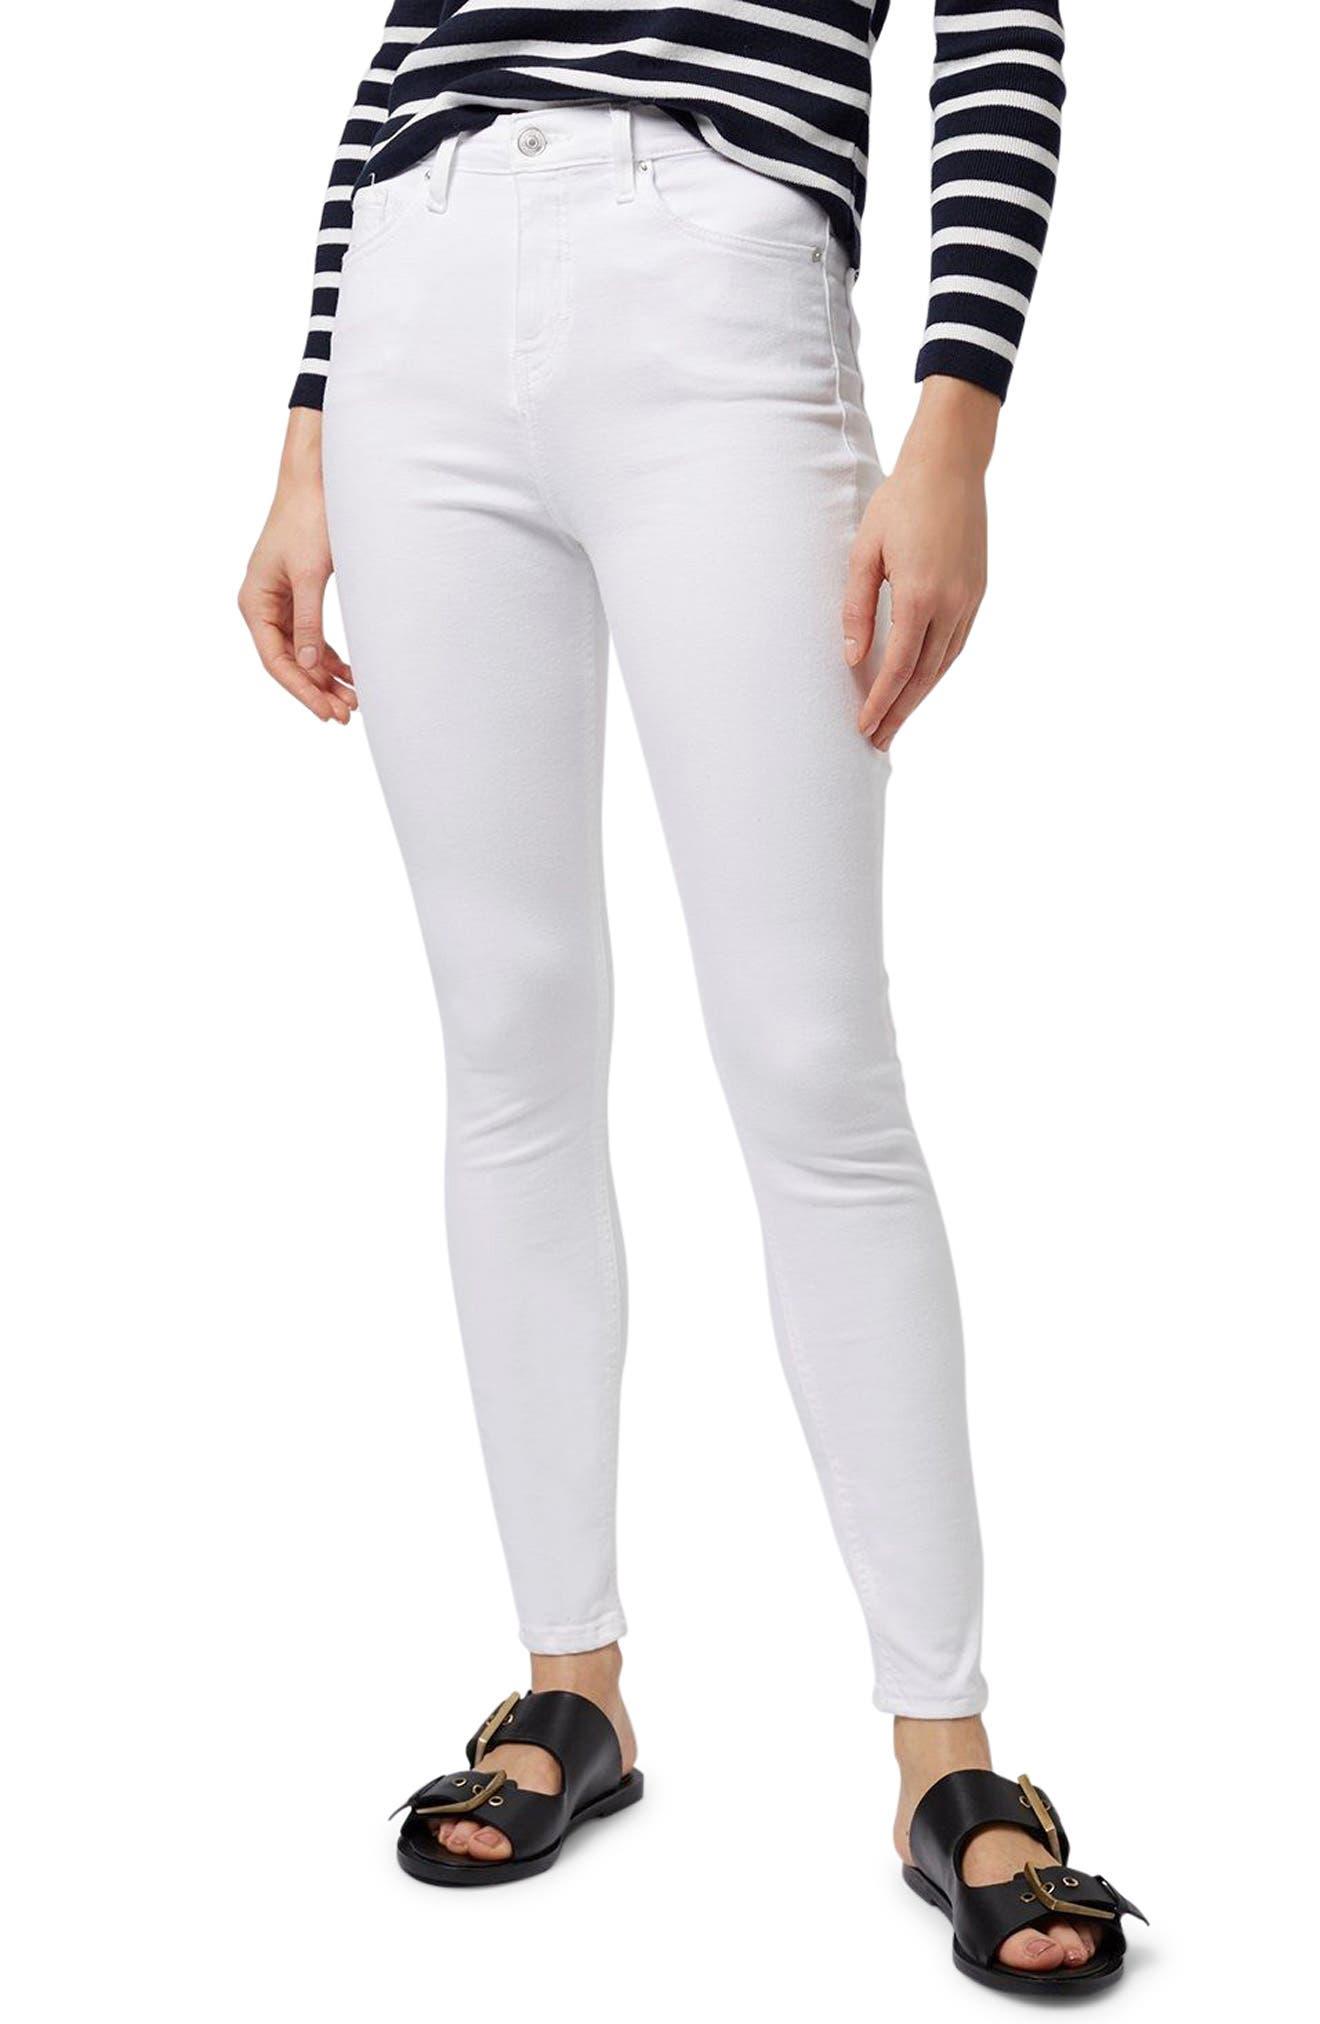 TOPSHOP, Moto Jamie Jeans, Main thumbnail 1, color, WHITE